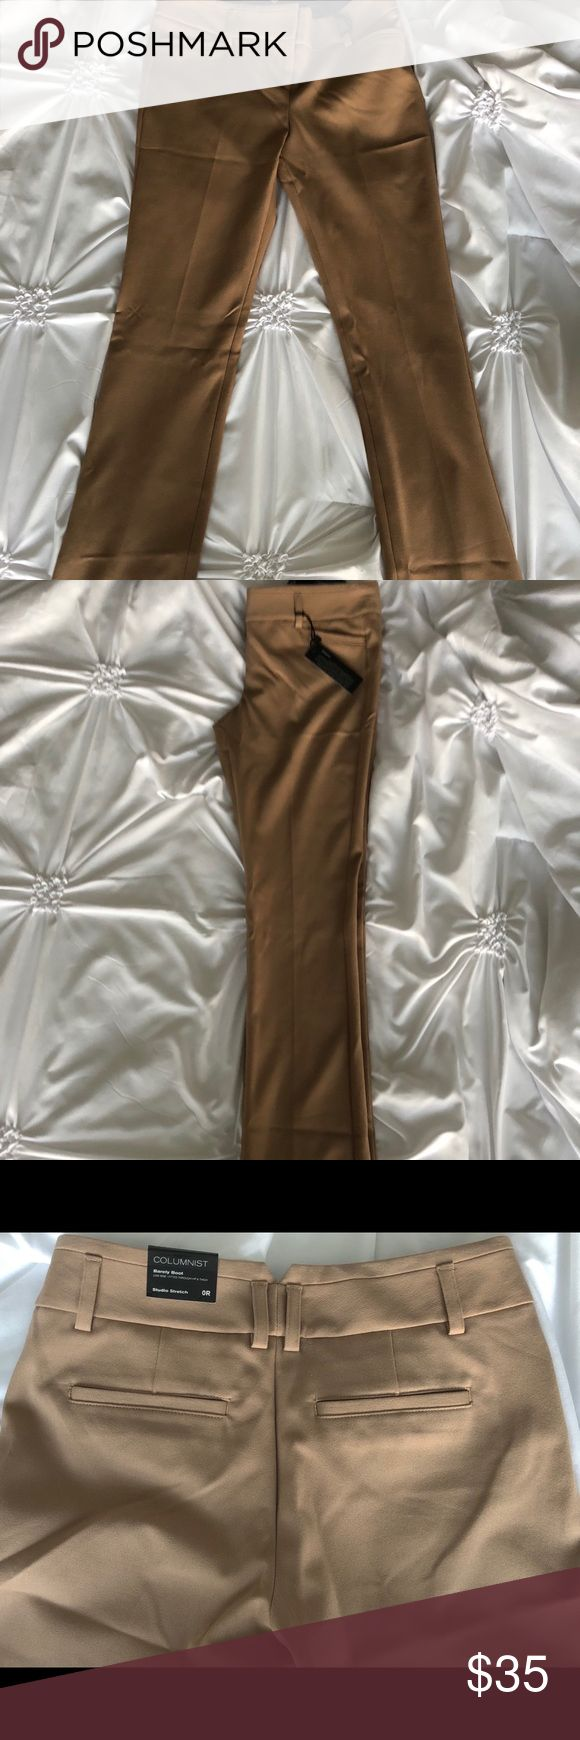 NWT Express Columnist Boot Dress Pants NWT! Never worn before. Express barely boot columnist dress pants. Super soft material! Express Pants Trousers